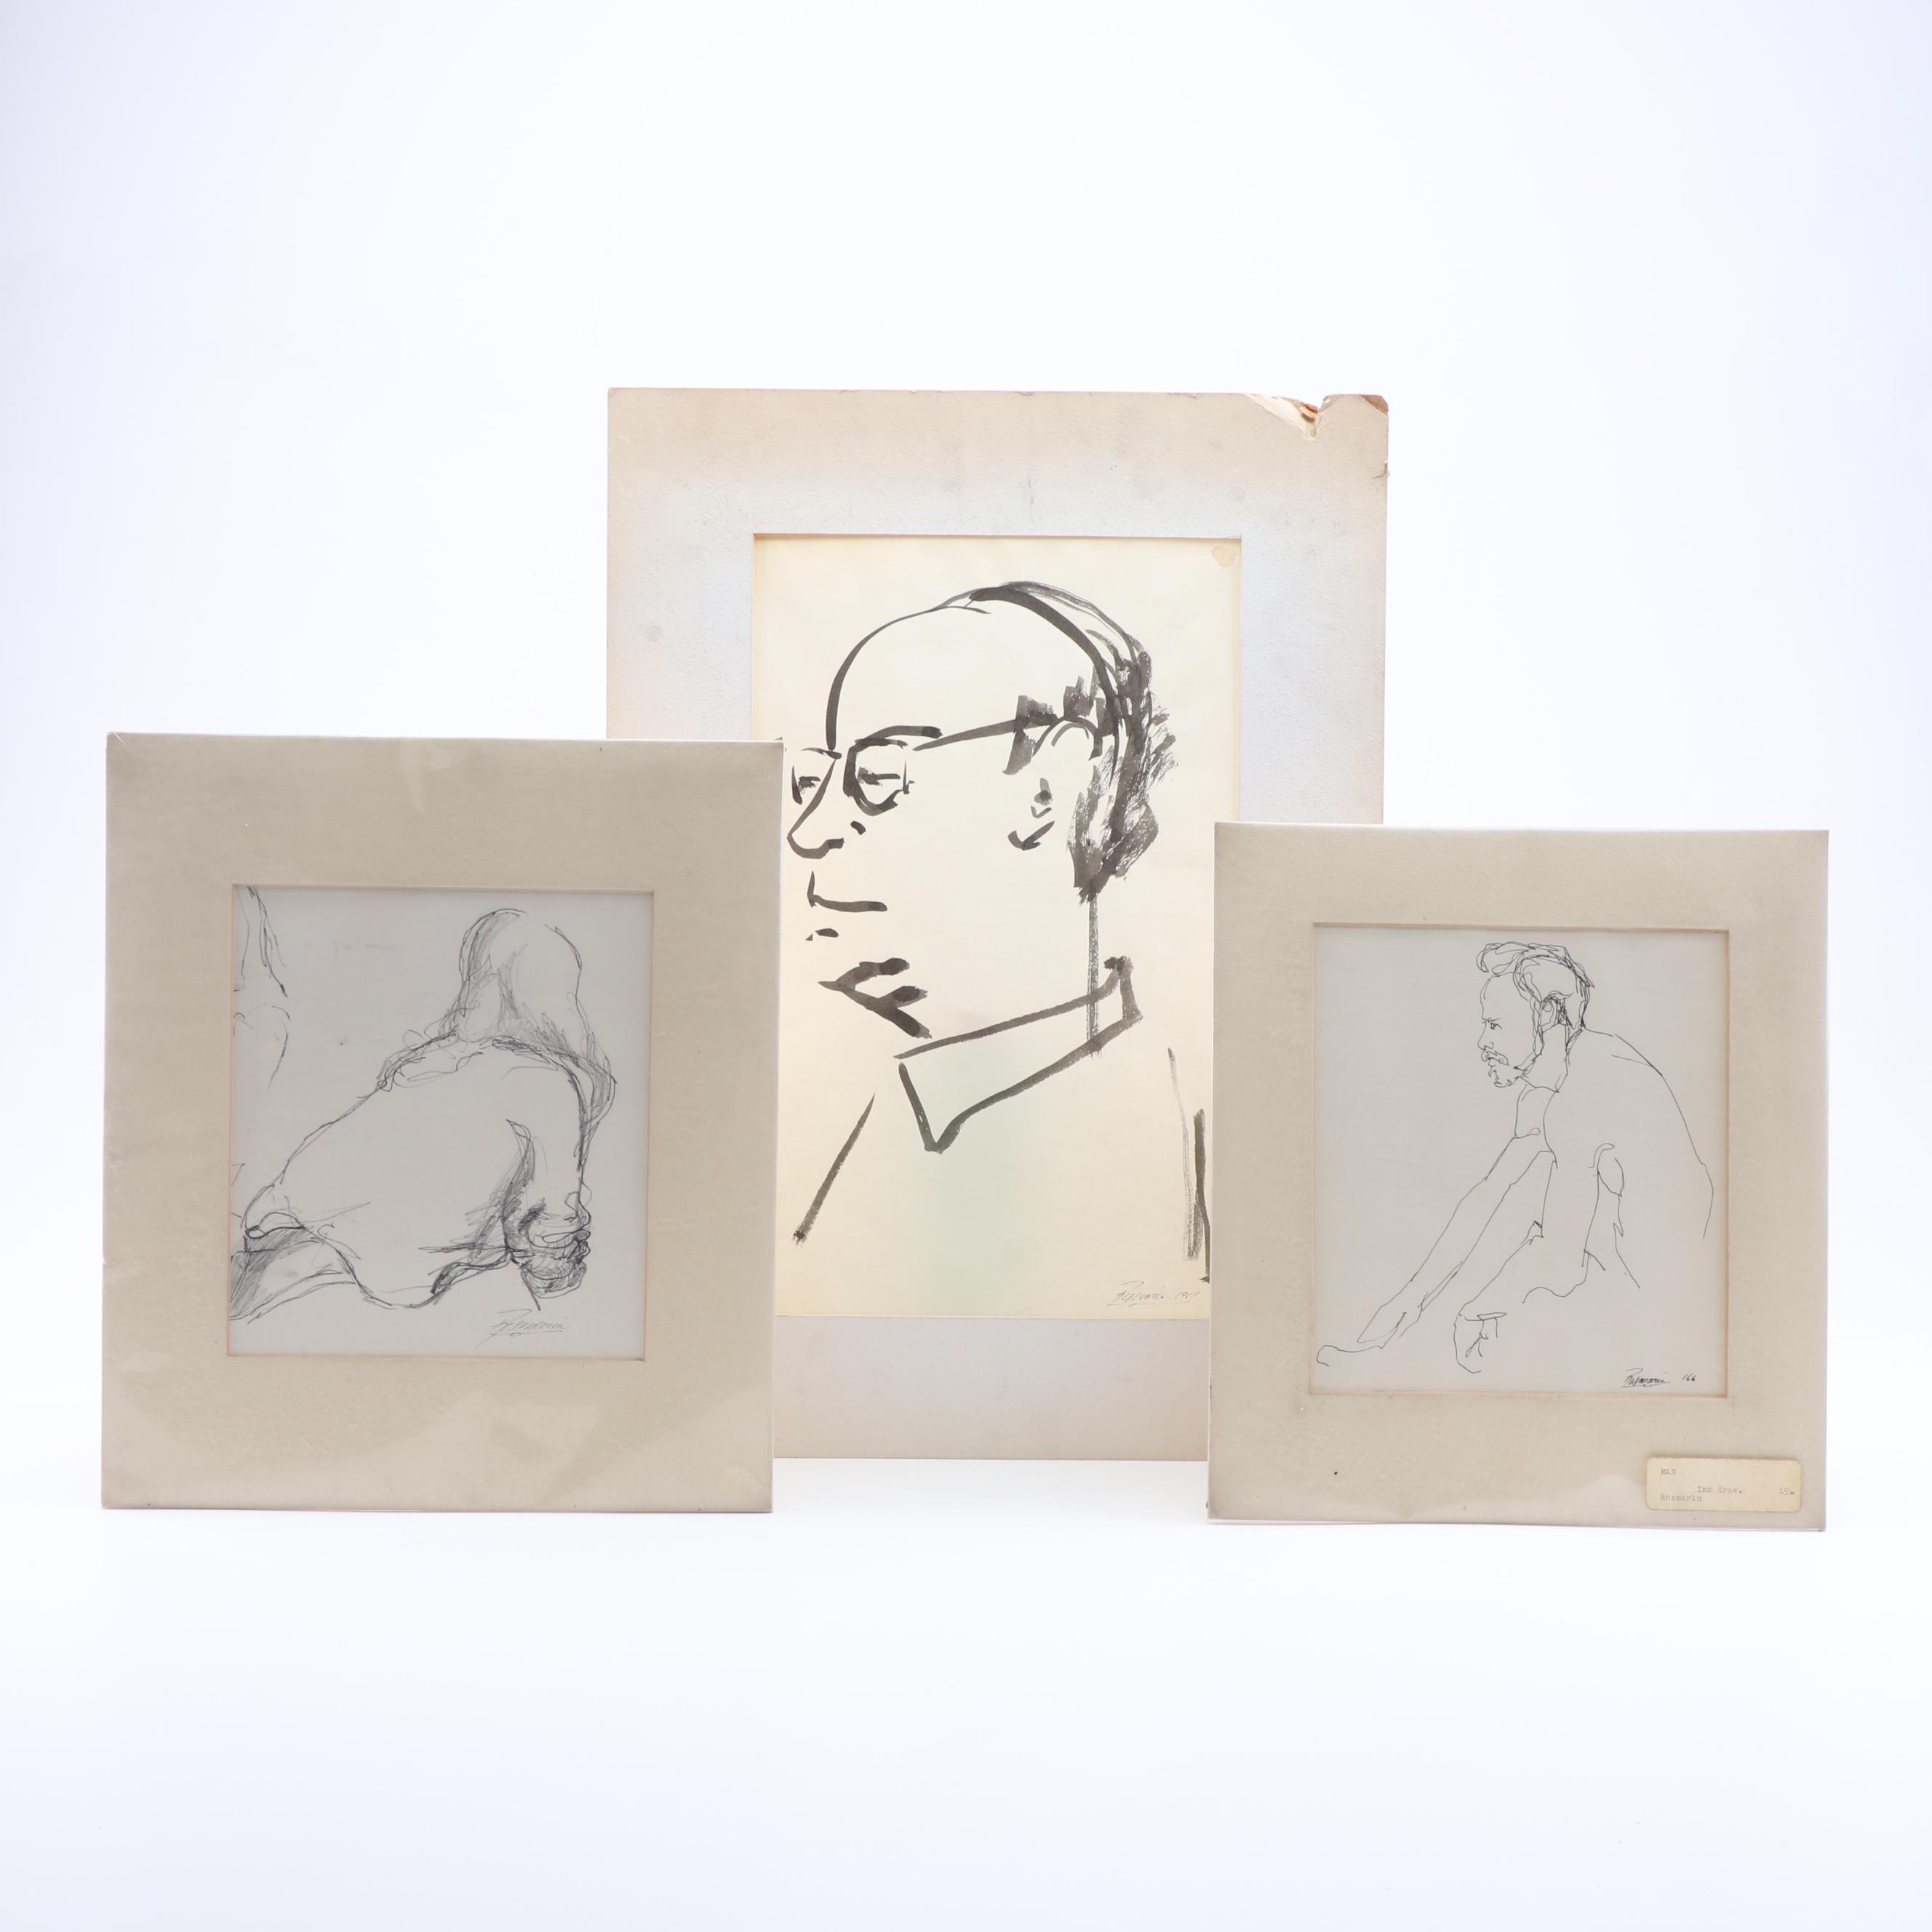 Richard Rosmarin Drawings, Mid 20th Century